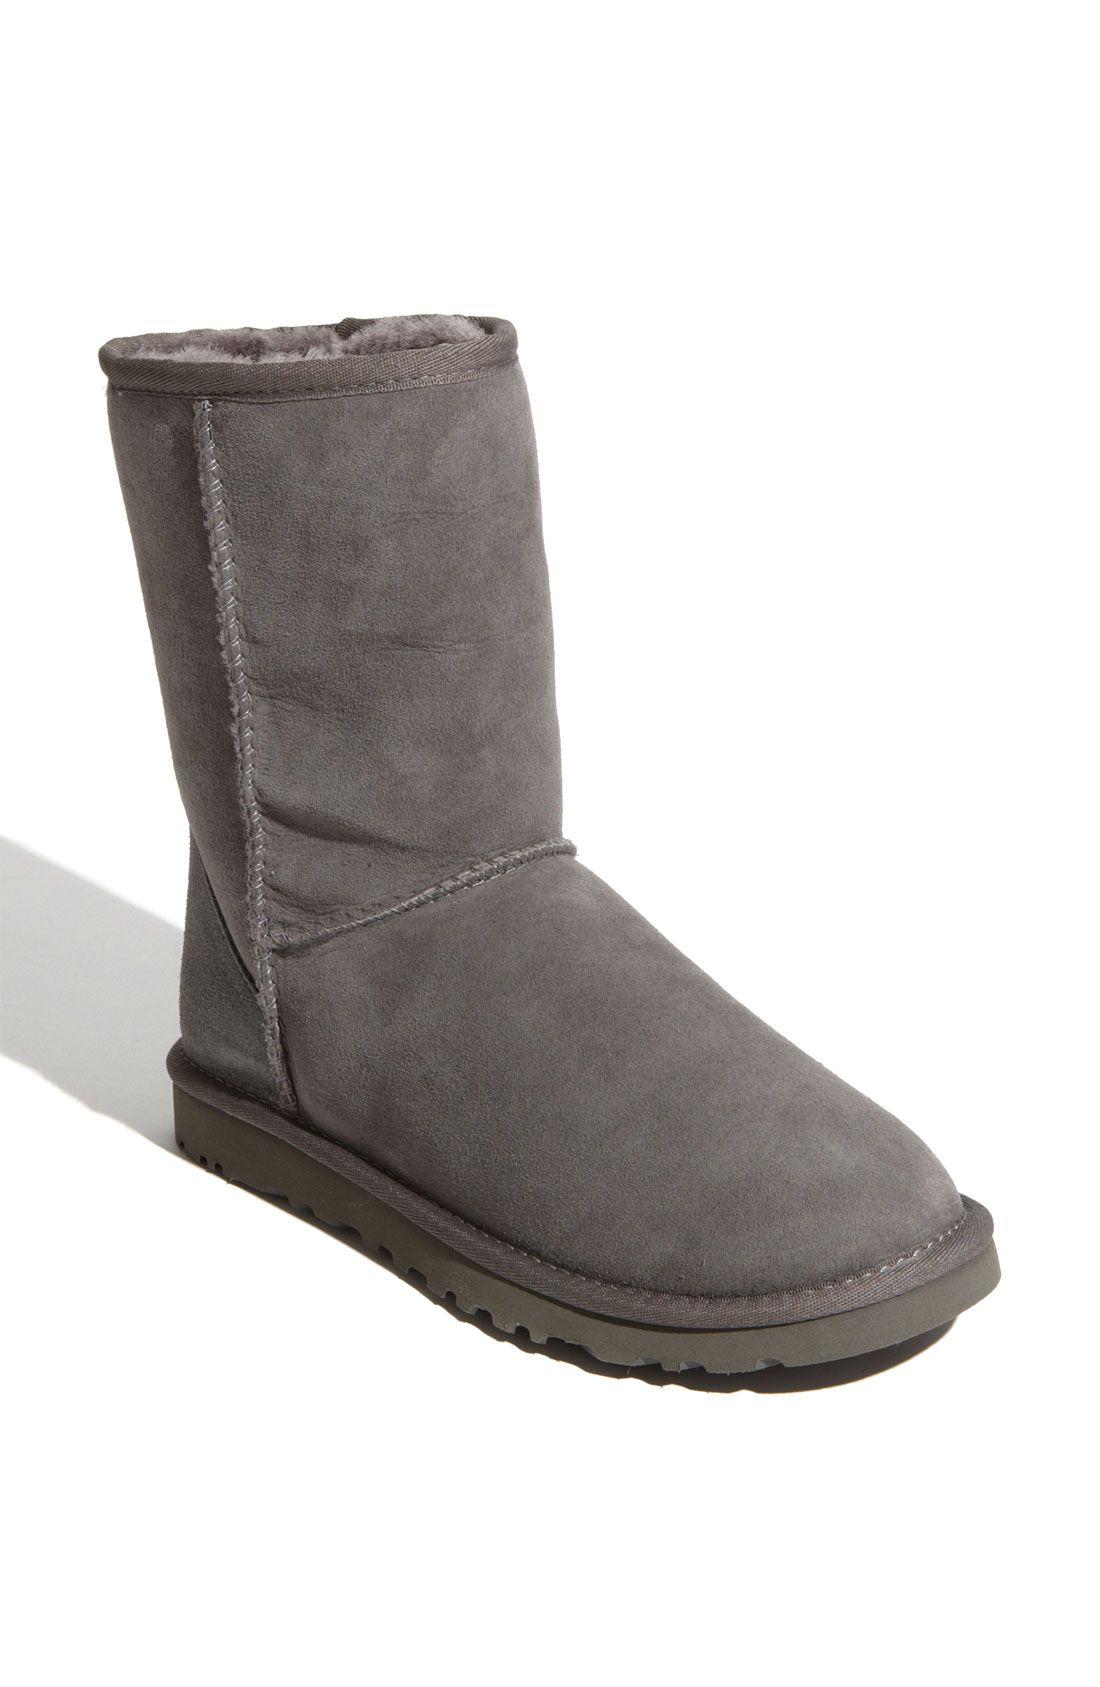 sale ugg boots online